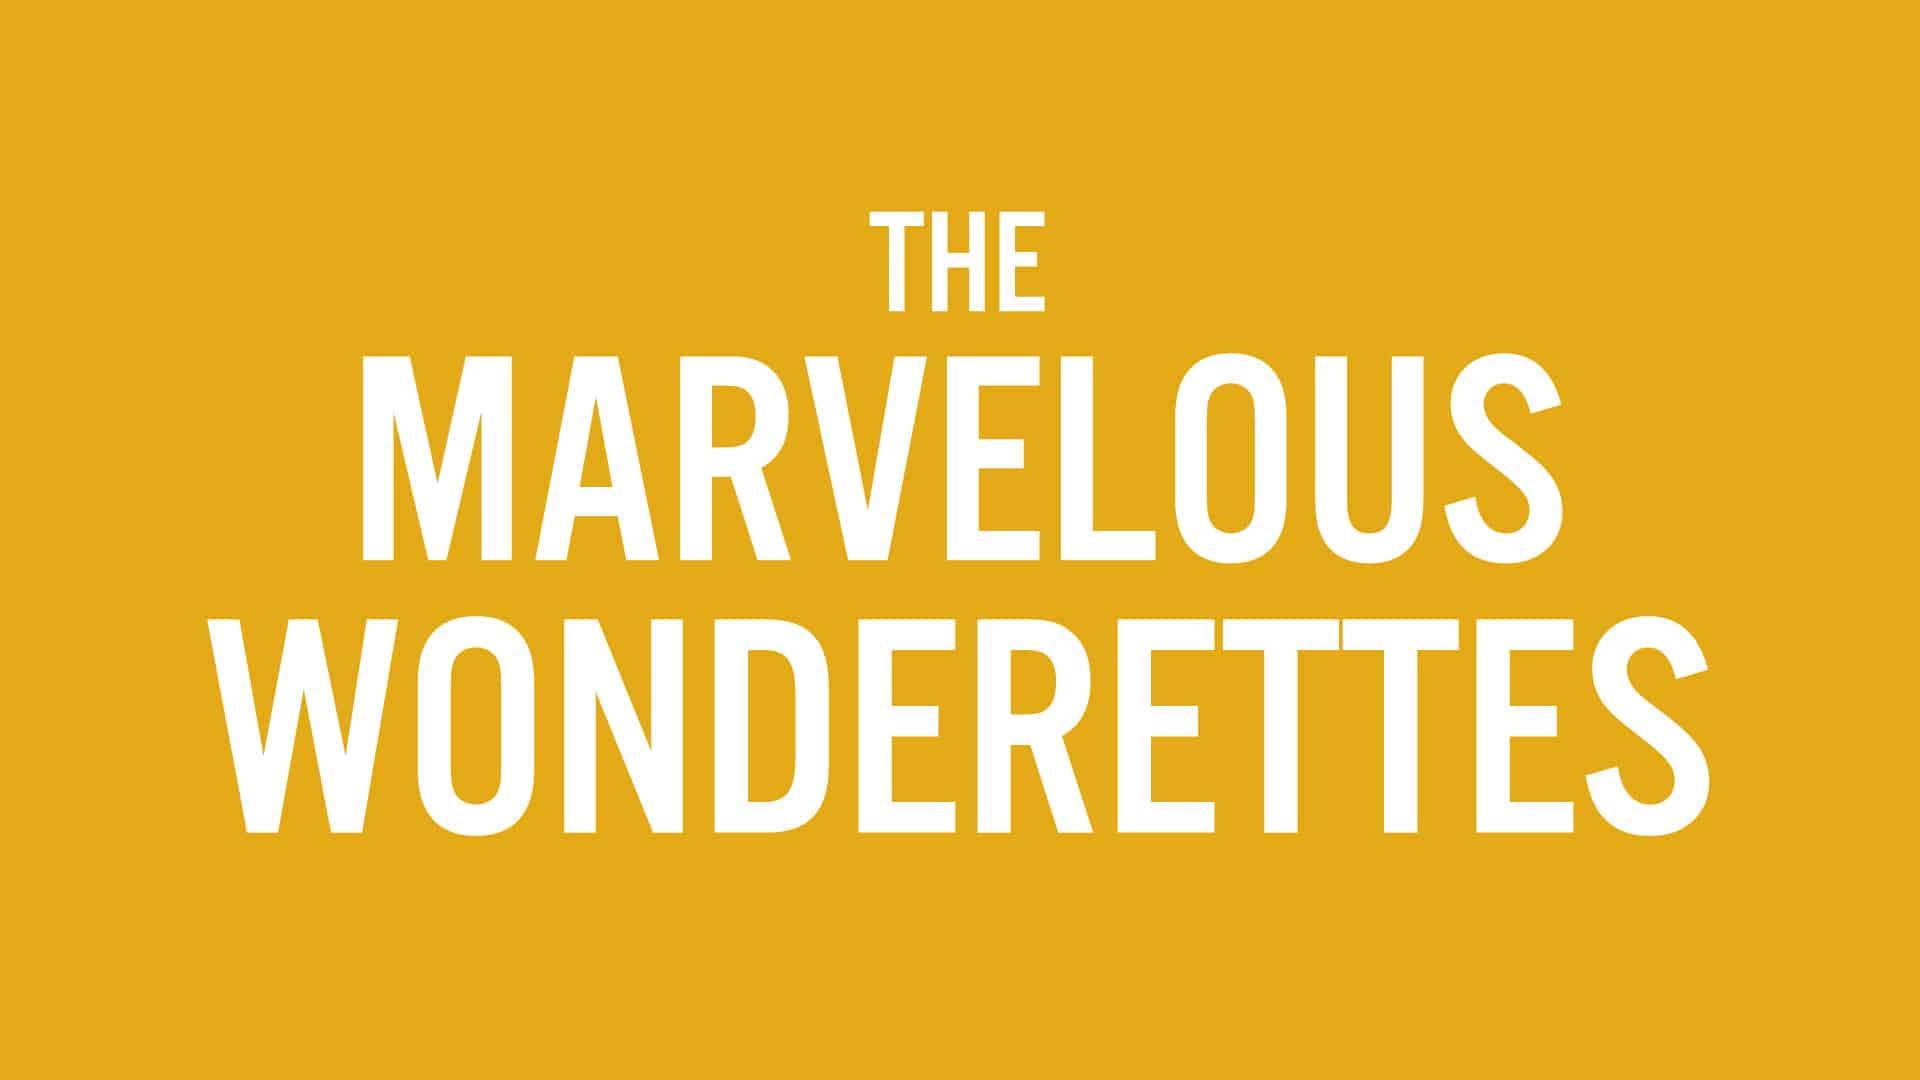 THE MARVELOUS WONDERETTES: MAY 24–JUN. 26, 2022